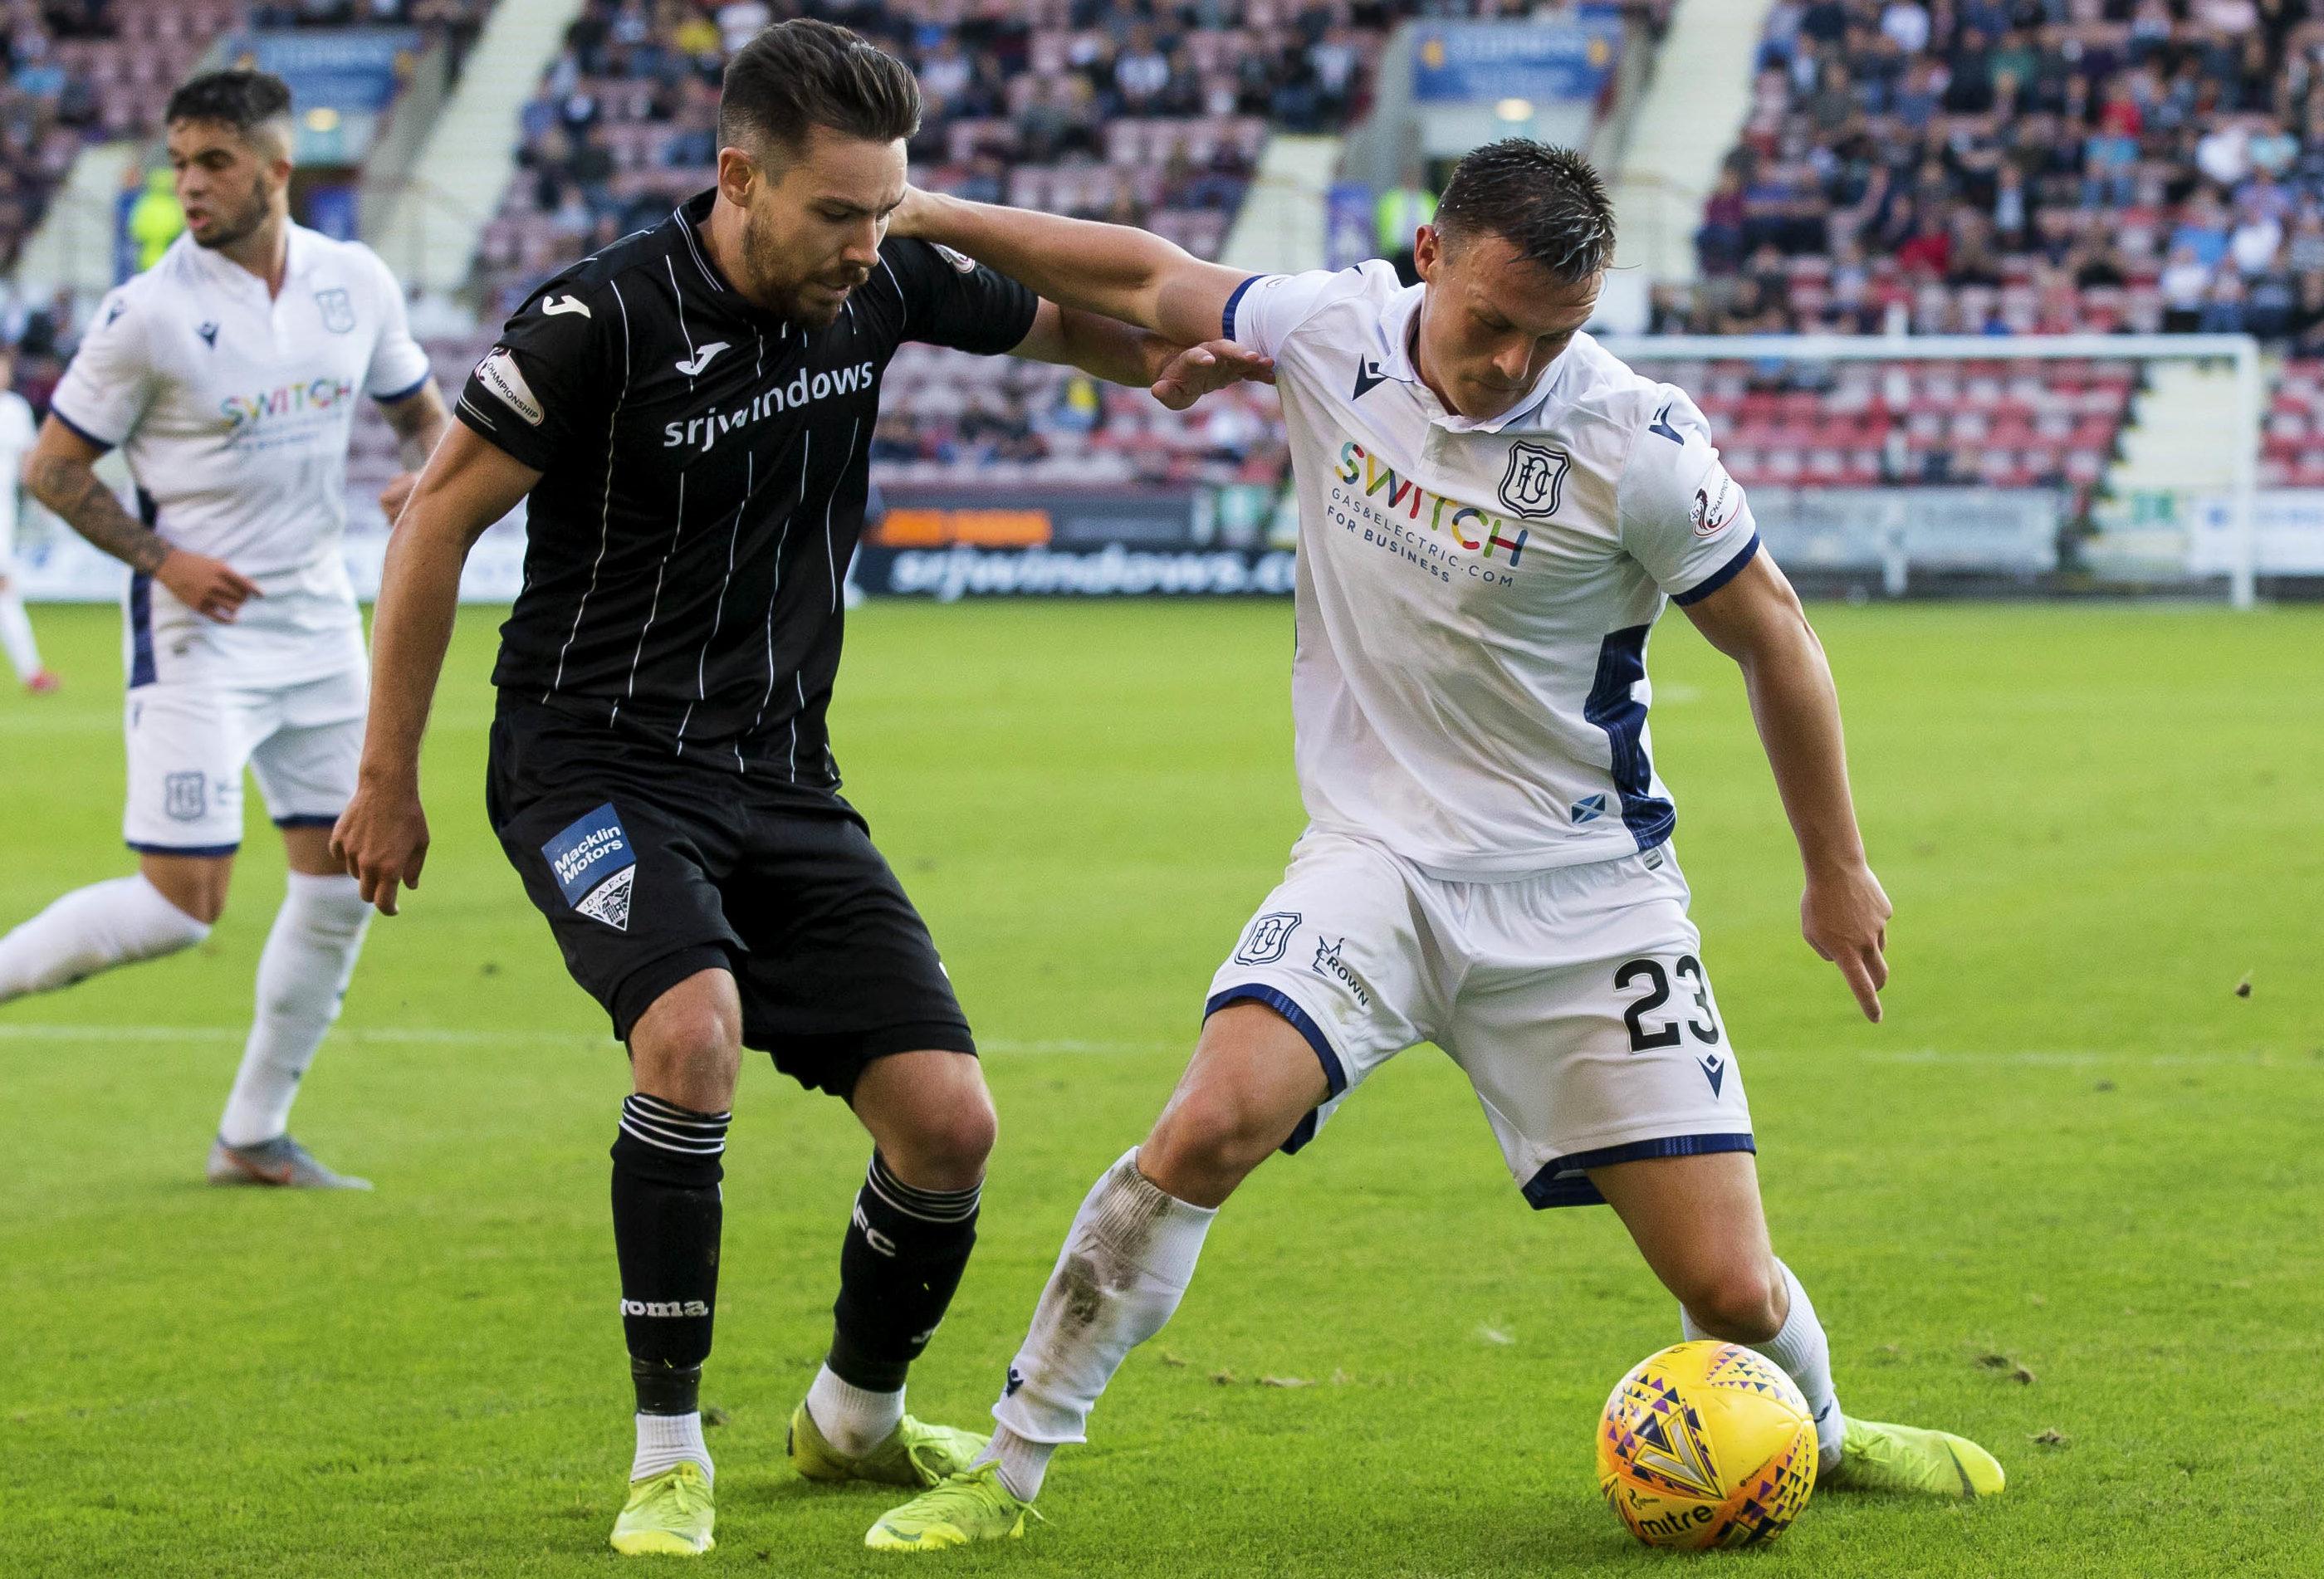 Jordan Marshall, right, holds off Dunfermline player Ryan Dow.